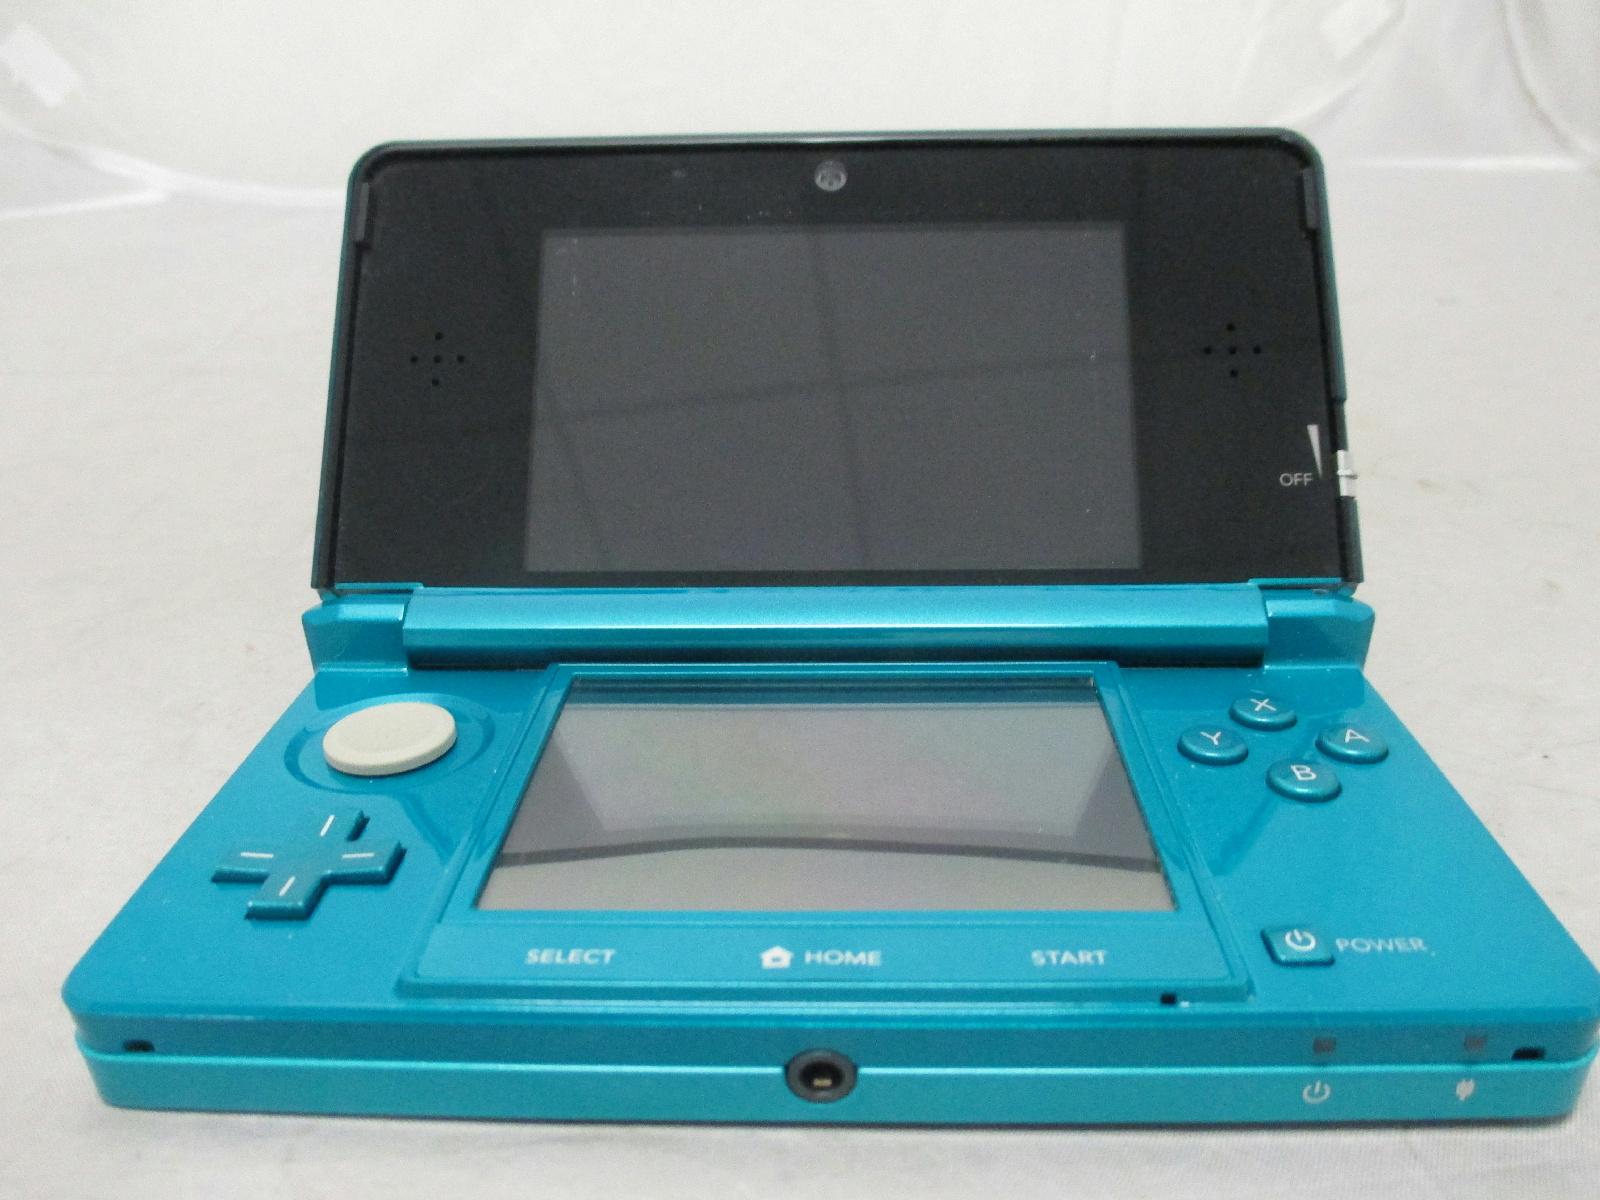 Aqua blue nintendo 3ds handheld video game console 45496500115 ebay - Nintendo 3ds handheld console ...